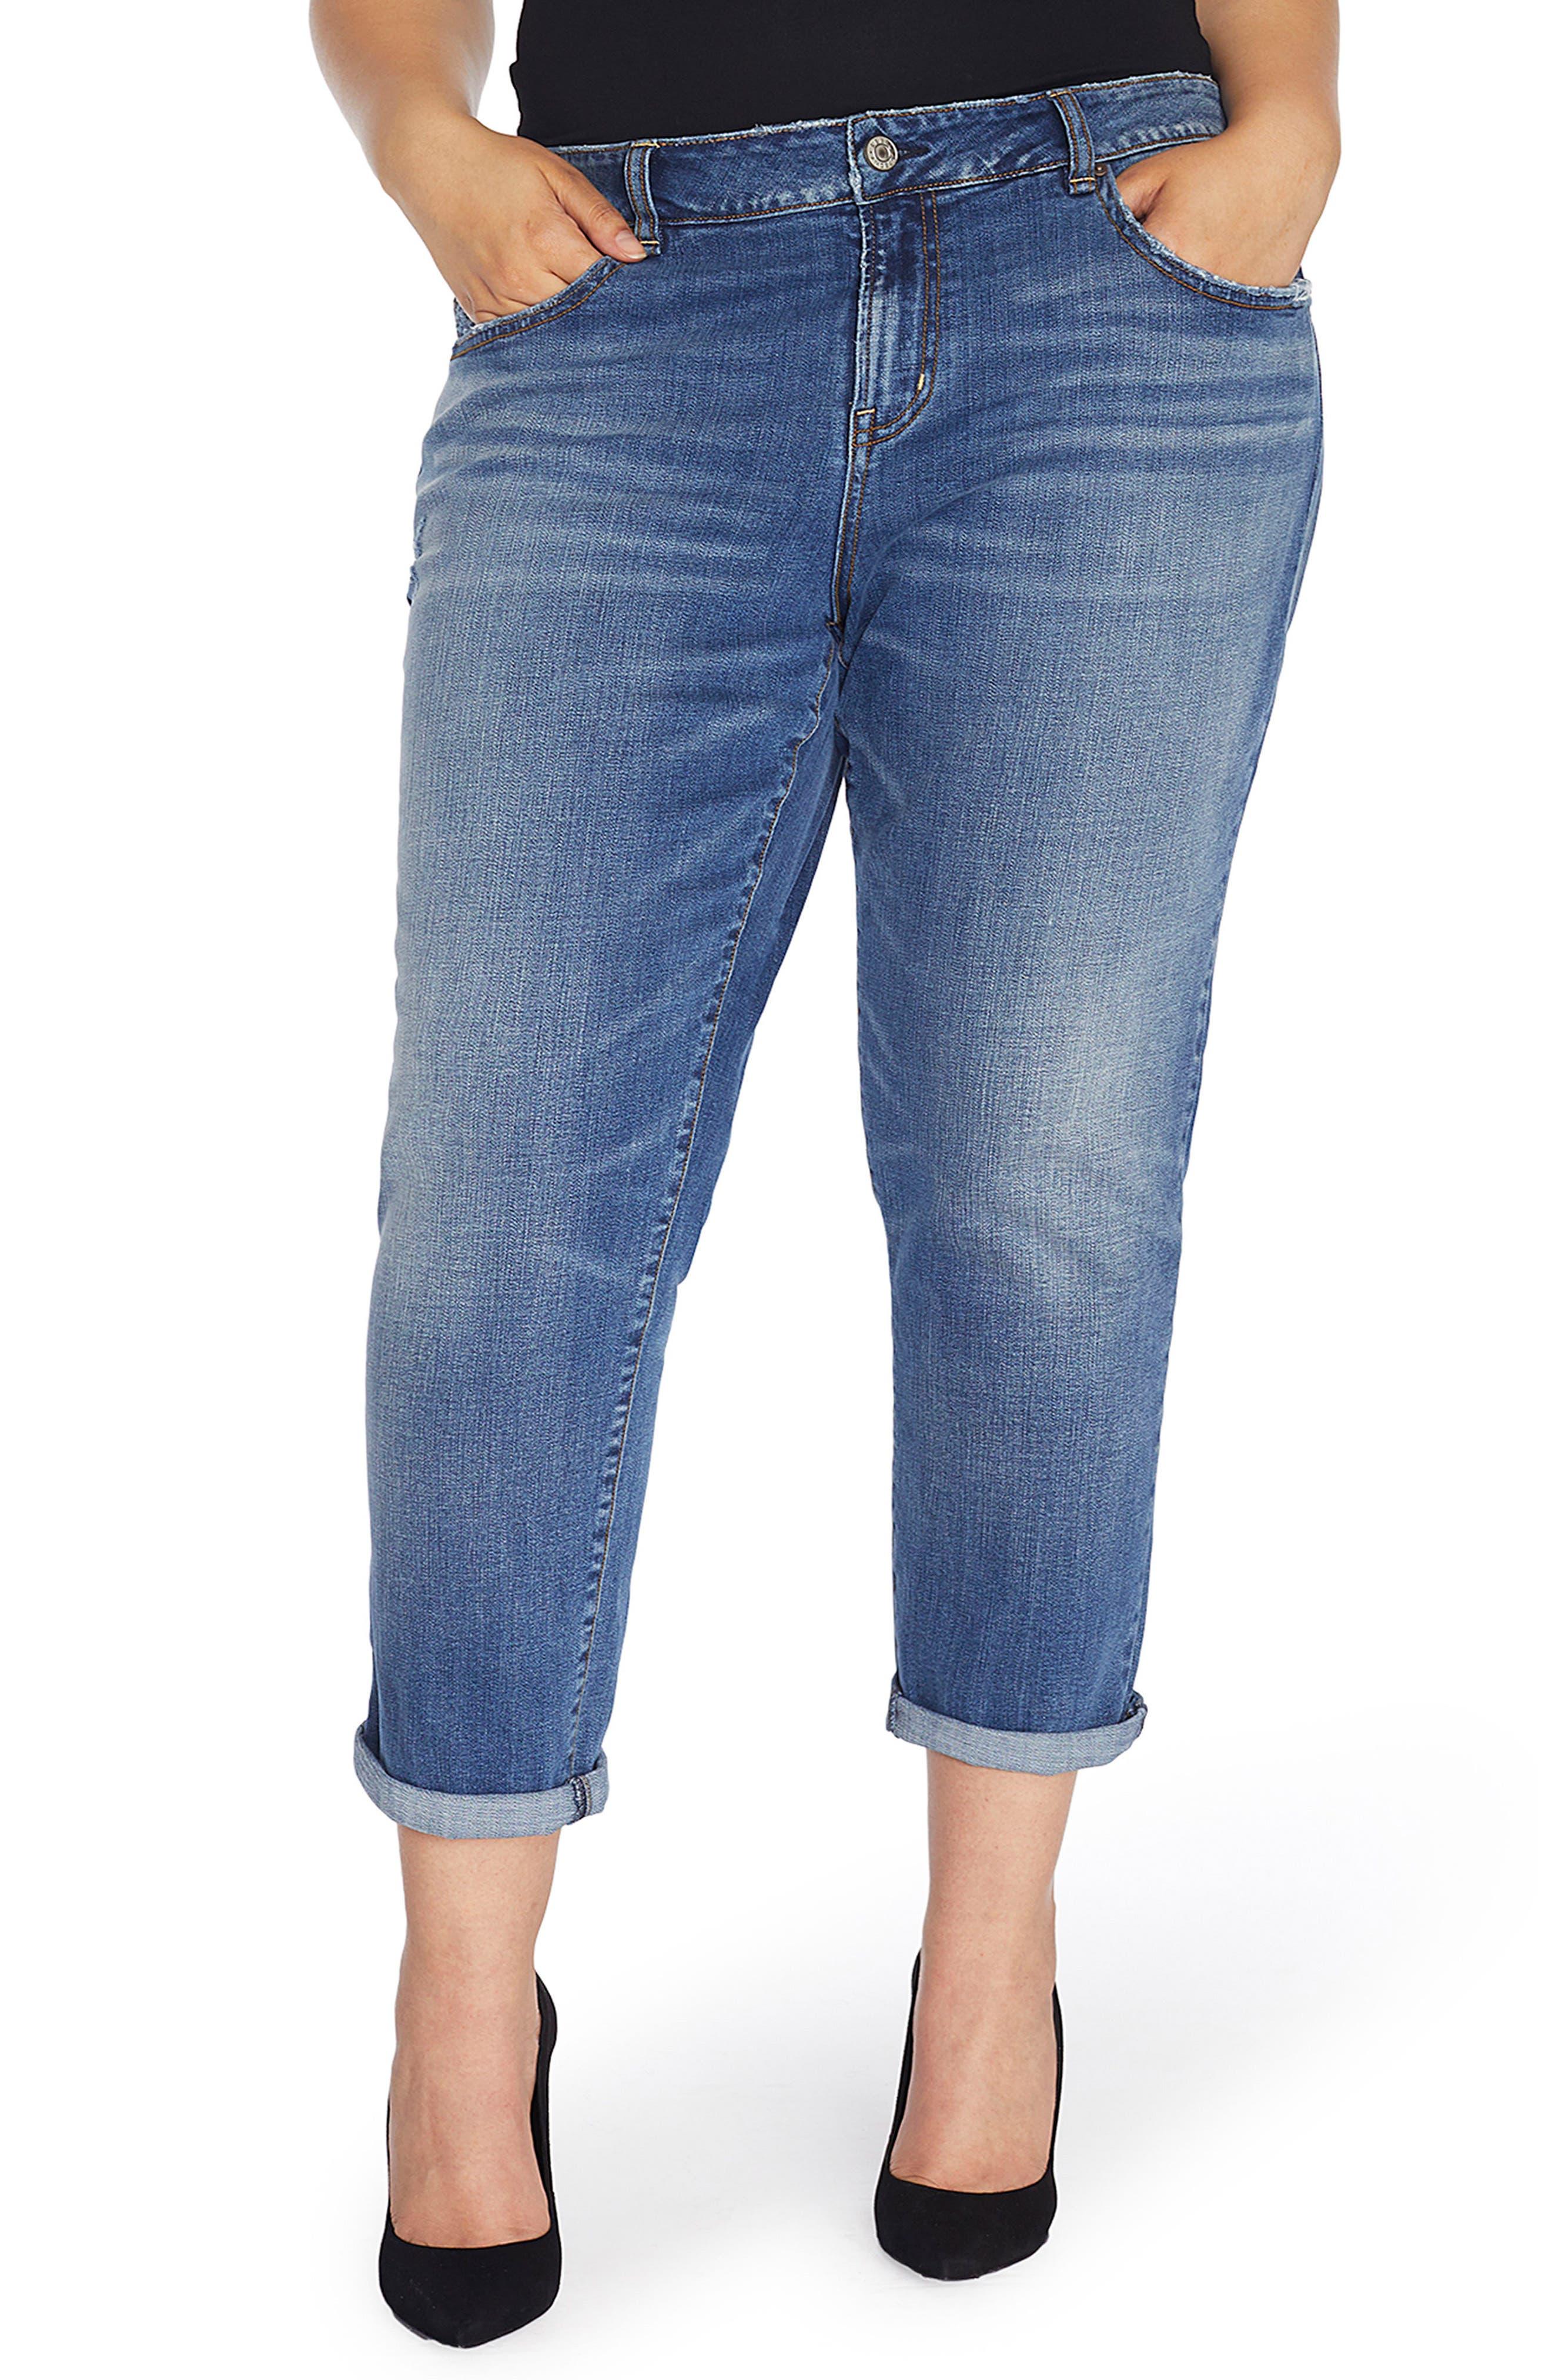 Alternate Image 1 Selected - Rebel Wilson x Angels The Ryot Slim Boyfriend Jeans (Plus Size)